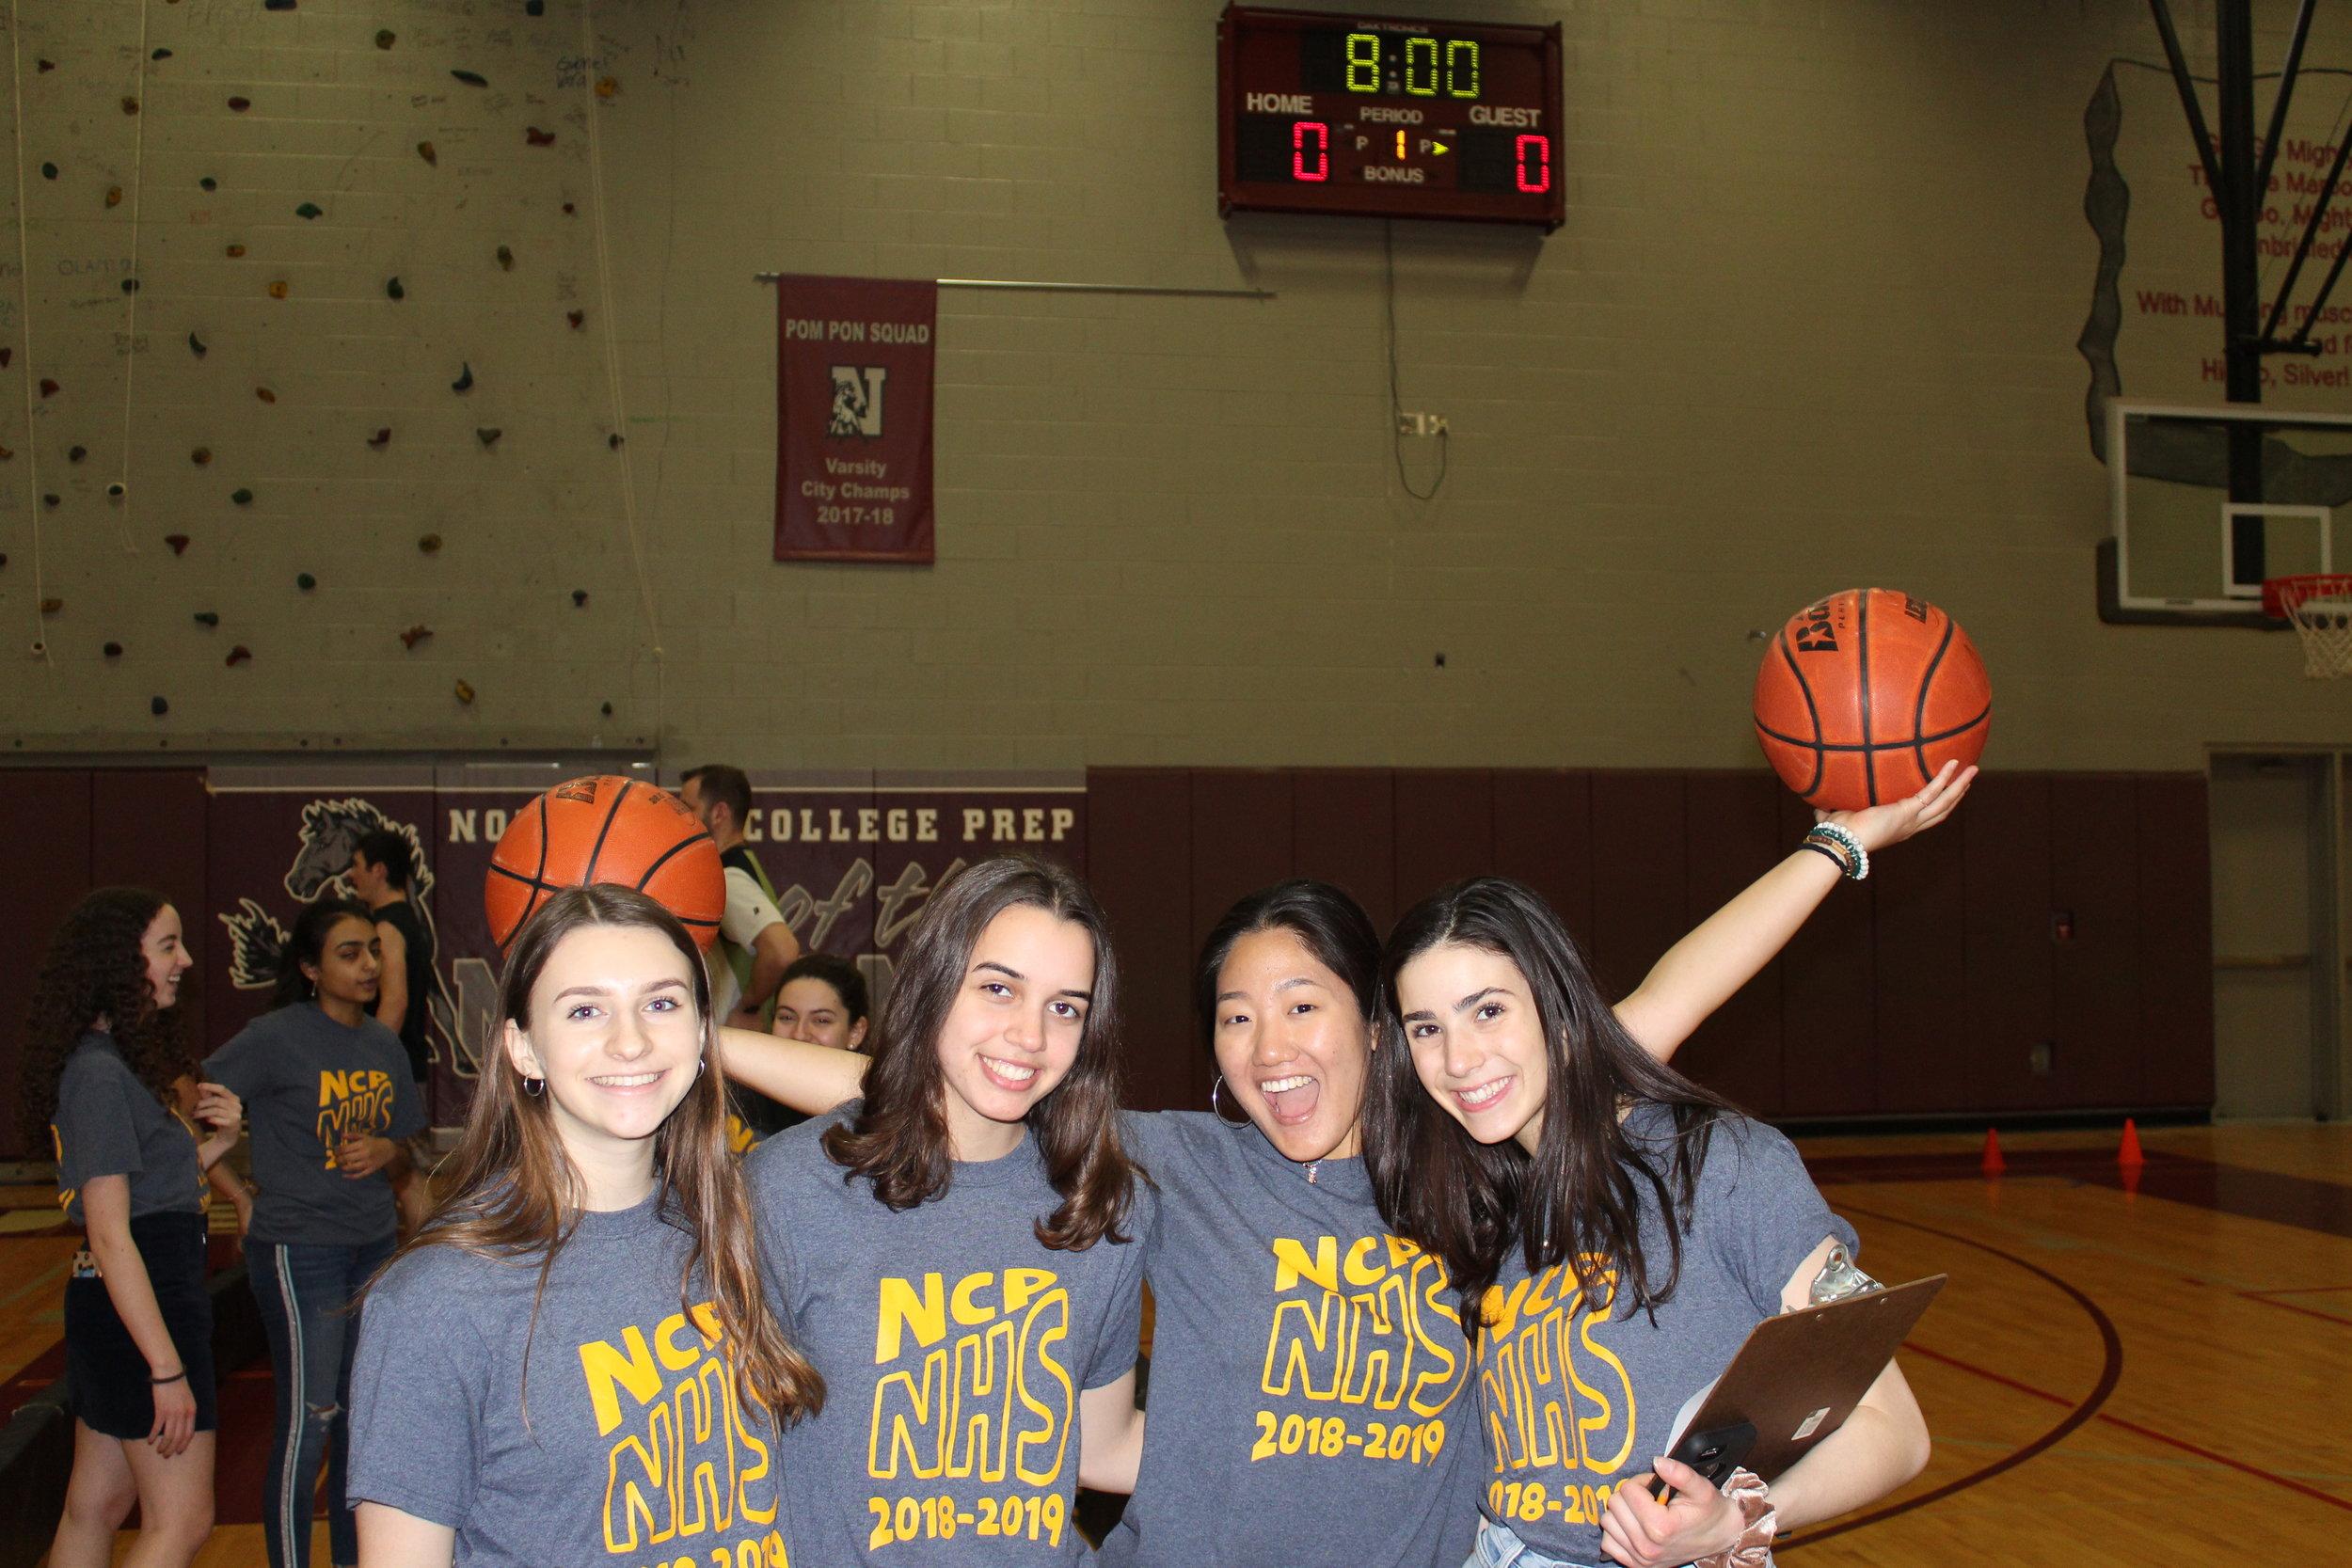 (Left to Right) Emilia Chojnacki Adv. 904, Isabella McLaughlin Adv. 900, Christina Yoon Adv. 903, and Hannah Shipley Adv. 903 Help Supervise the Tournament R.